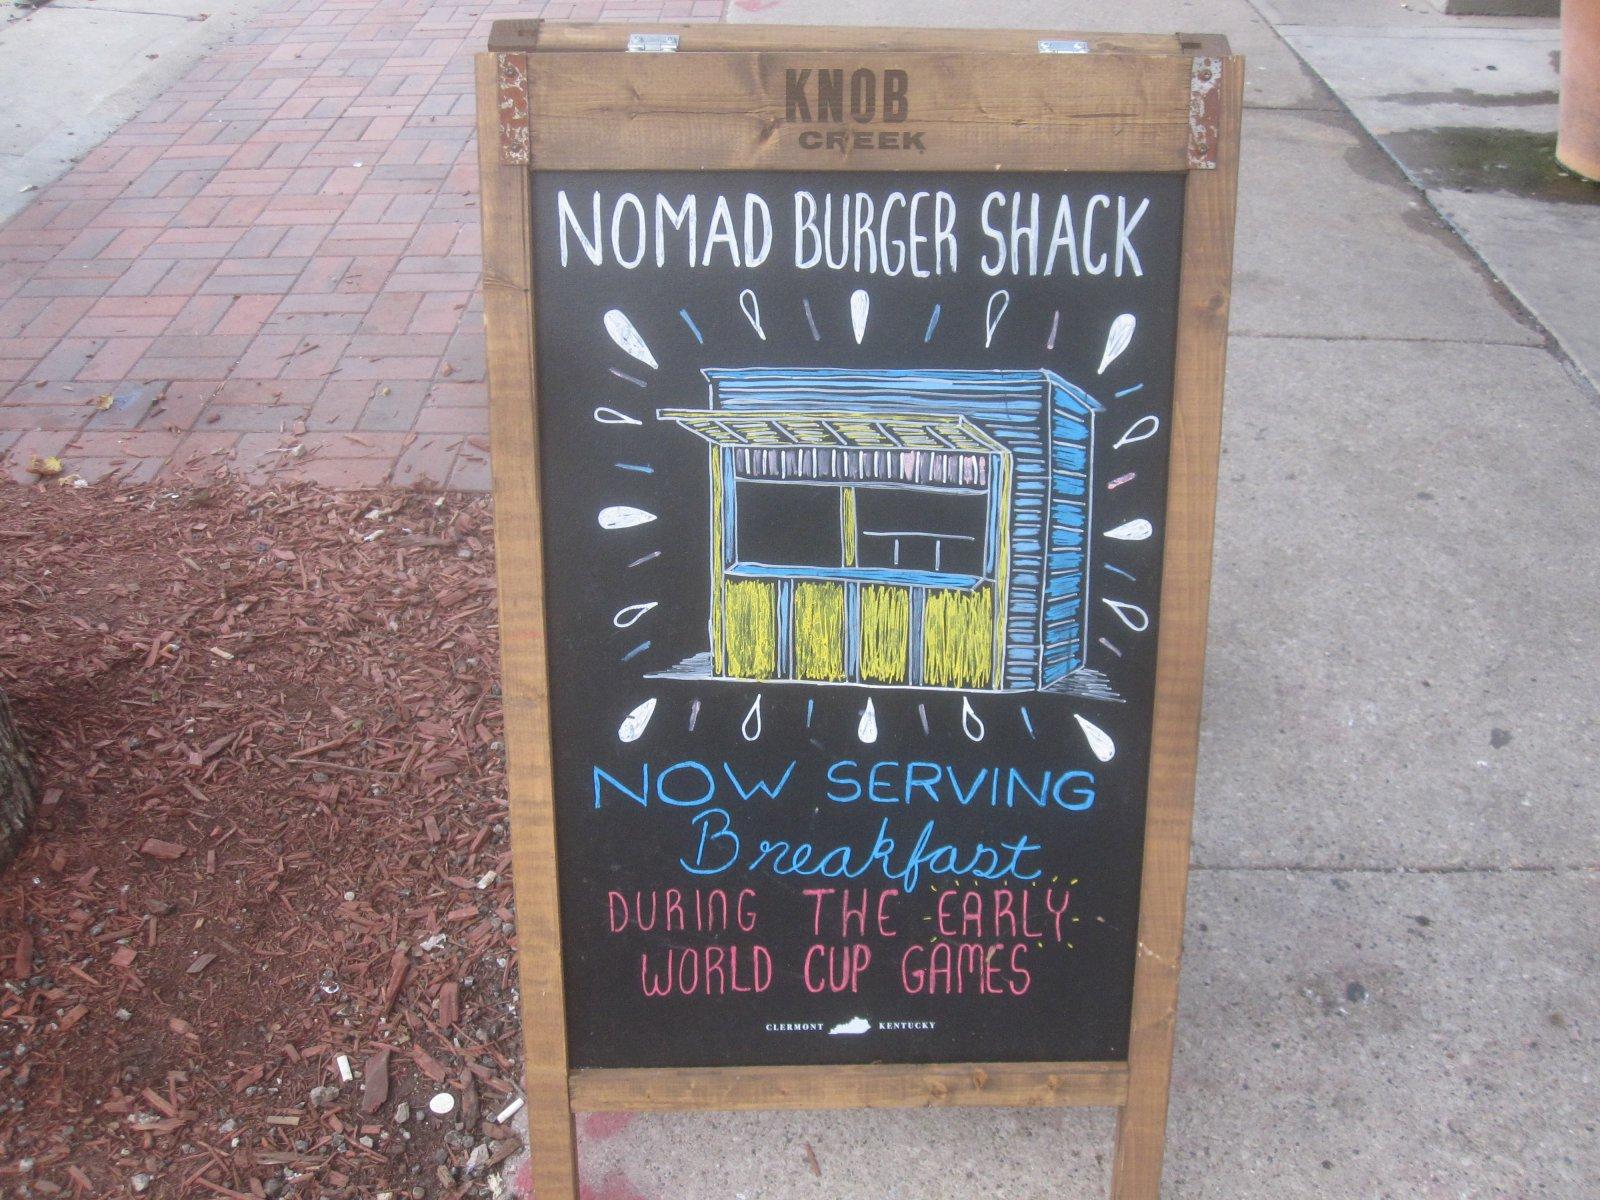 Nomad Burger Shack